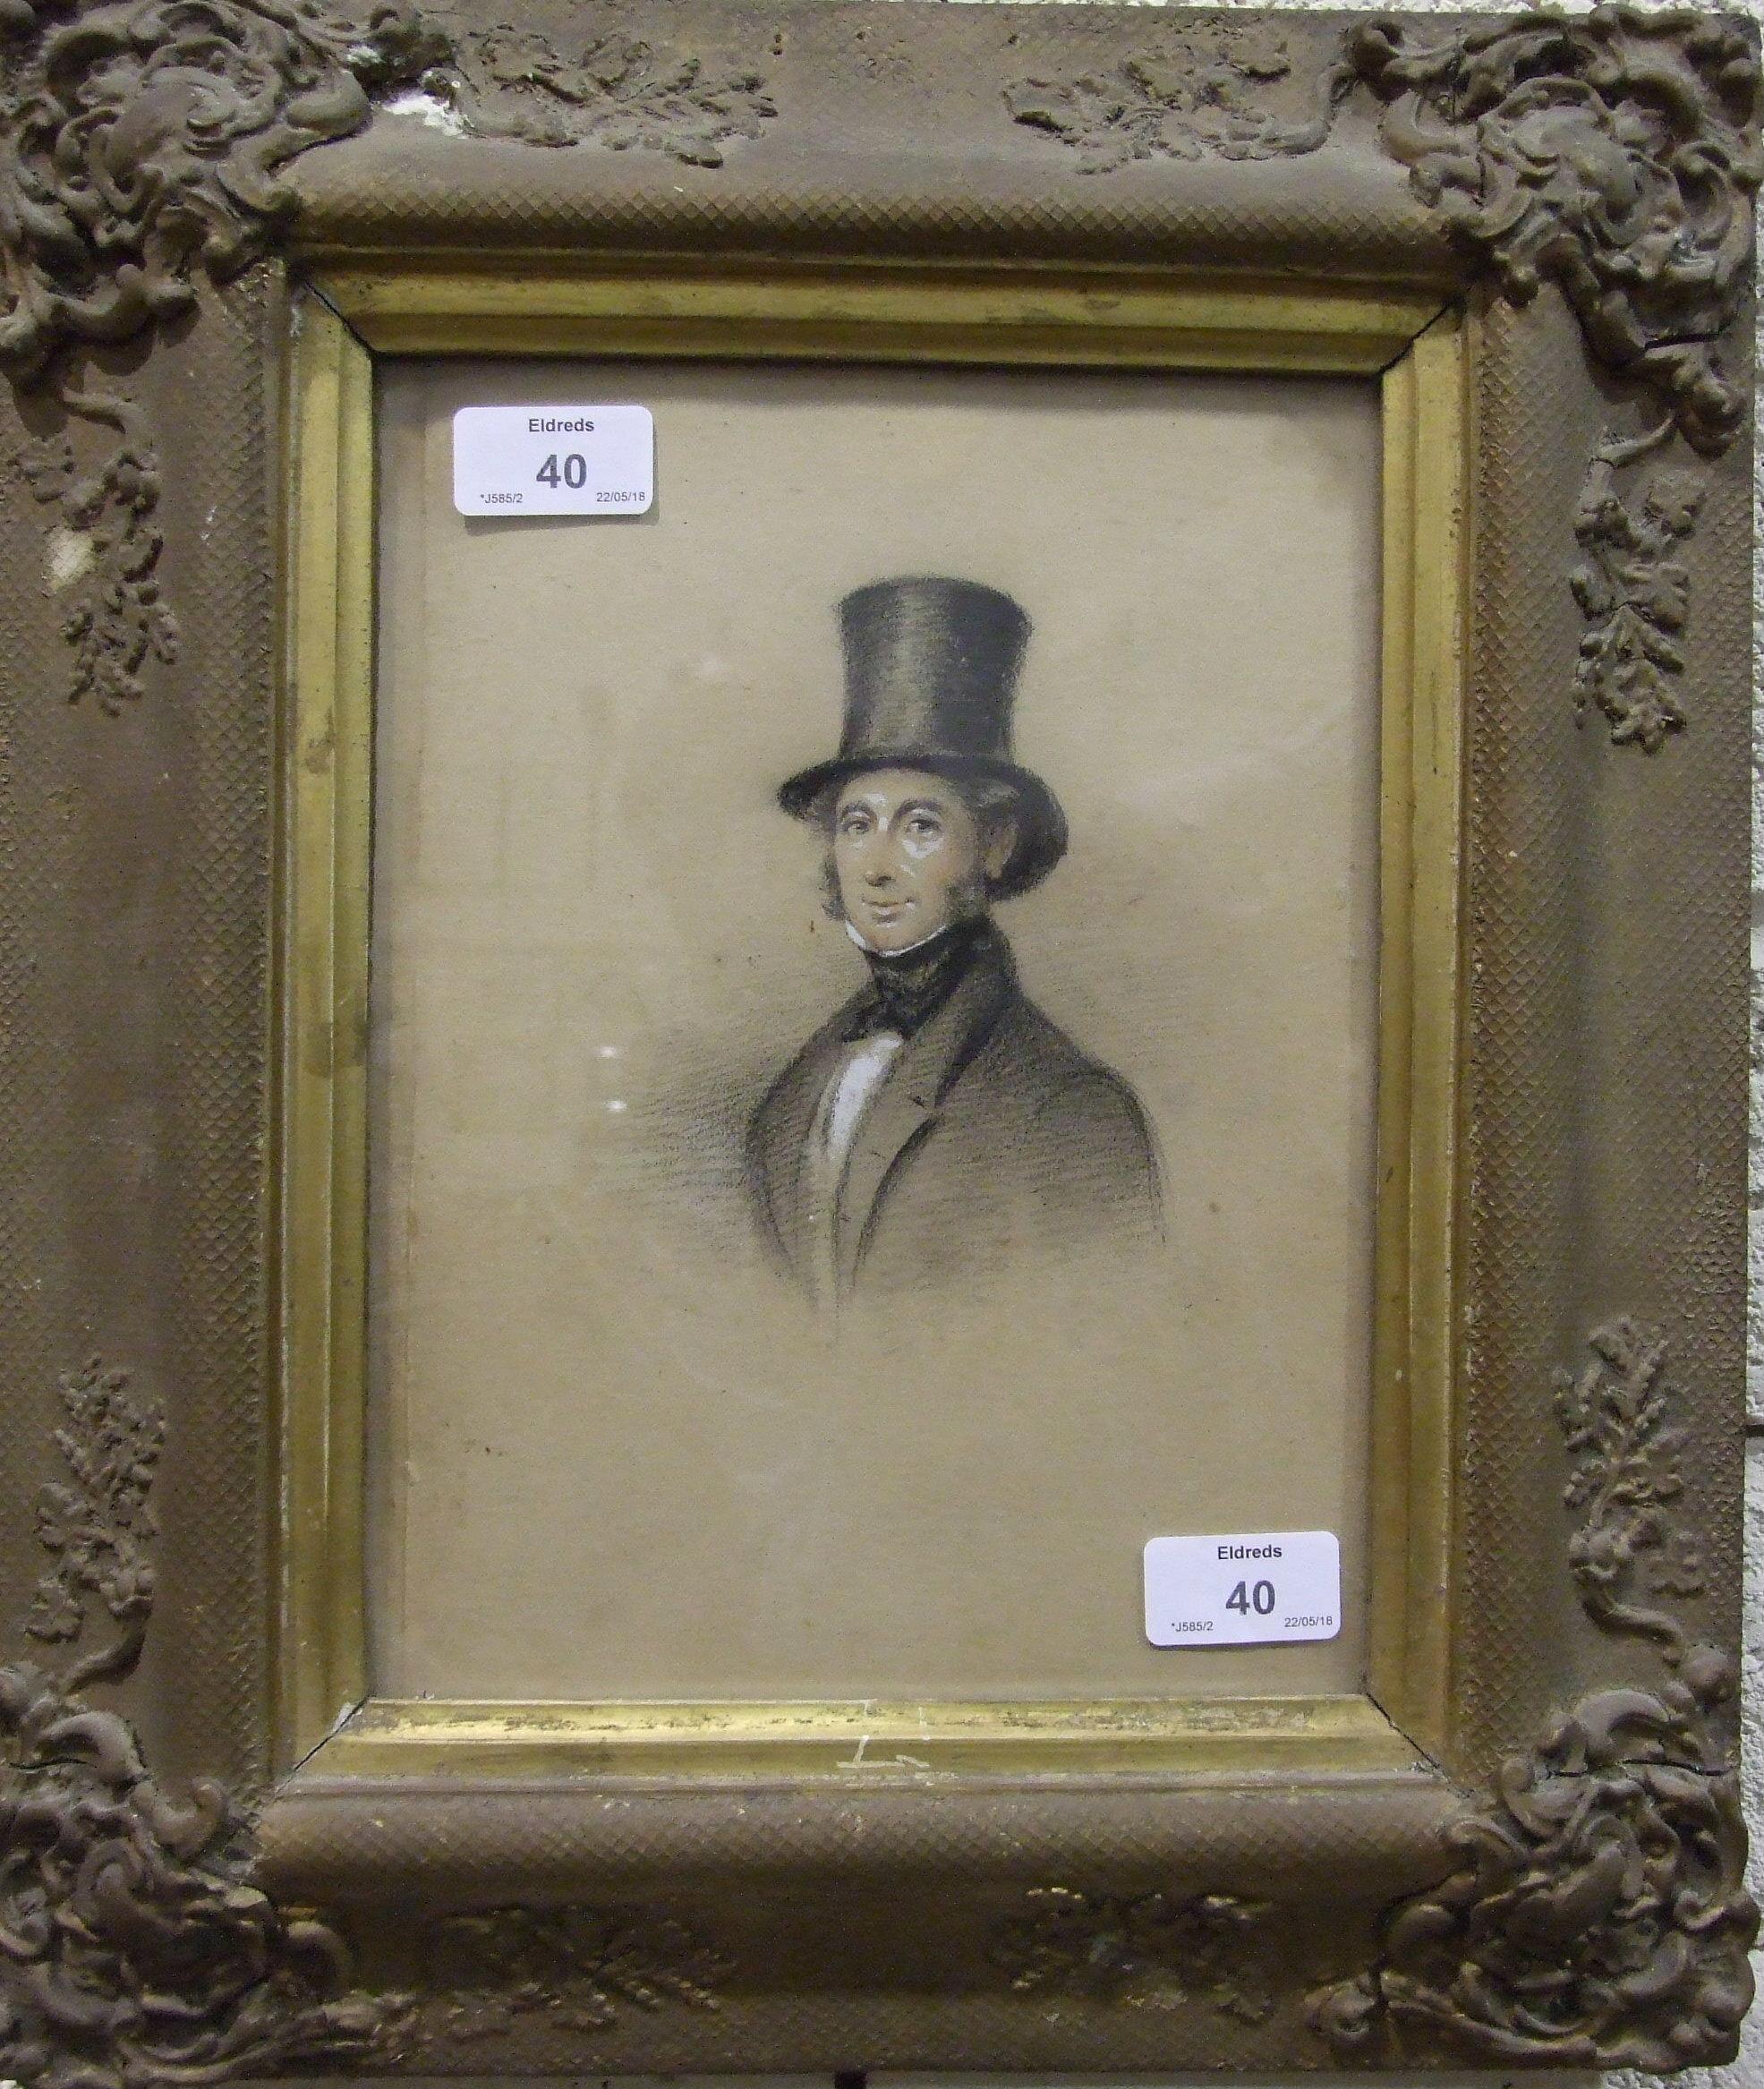 19th century Irish School HALF-LENGTH PORTRAIT OF NOBLE JOHNSON OF ROCKINGHAM, COUNTY CORK, - Image 2 of 2